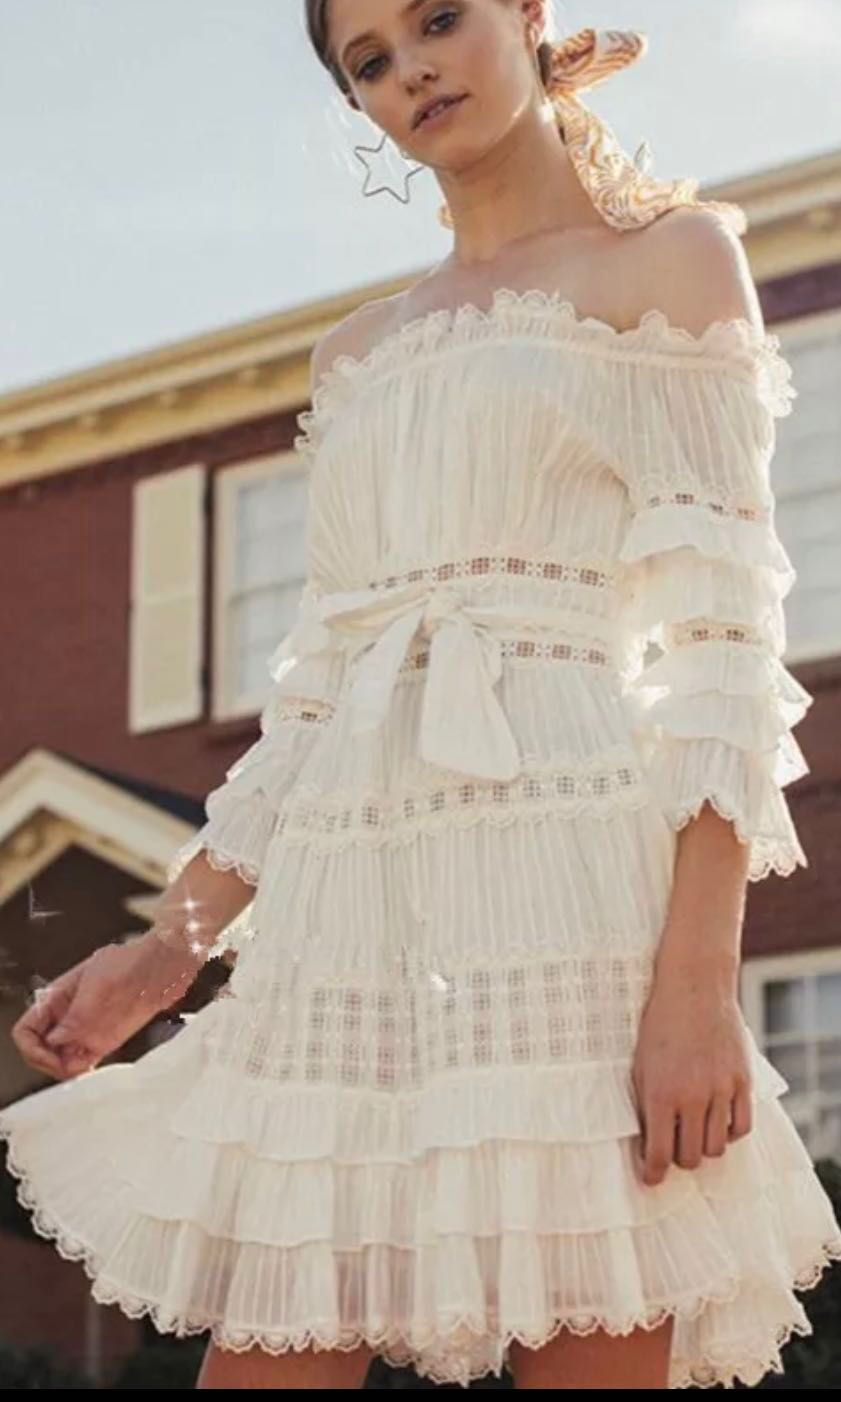 43b1d902241 Zimmerman inspired off shoulder white 3 4 sleeves multi frills tier summer  dress